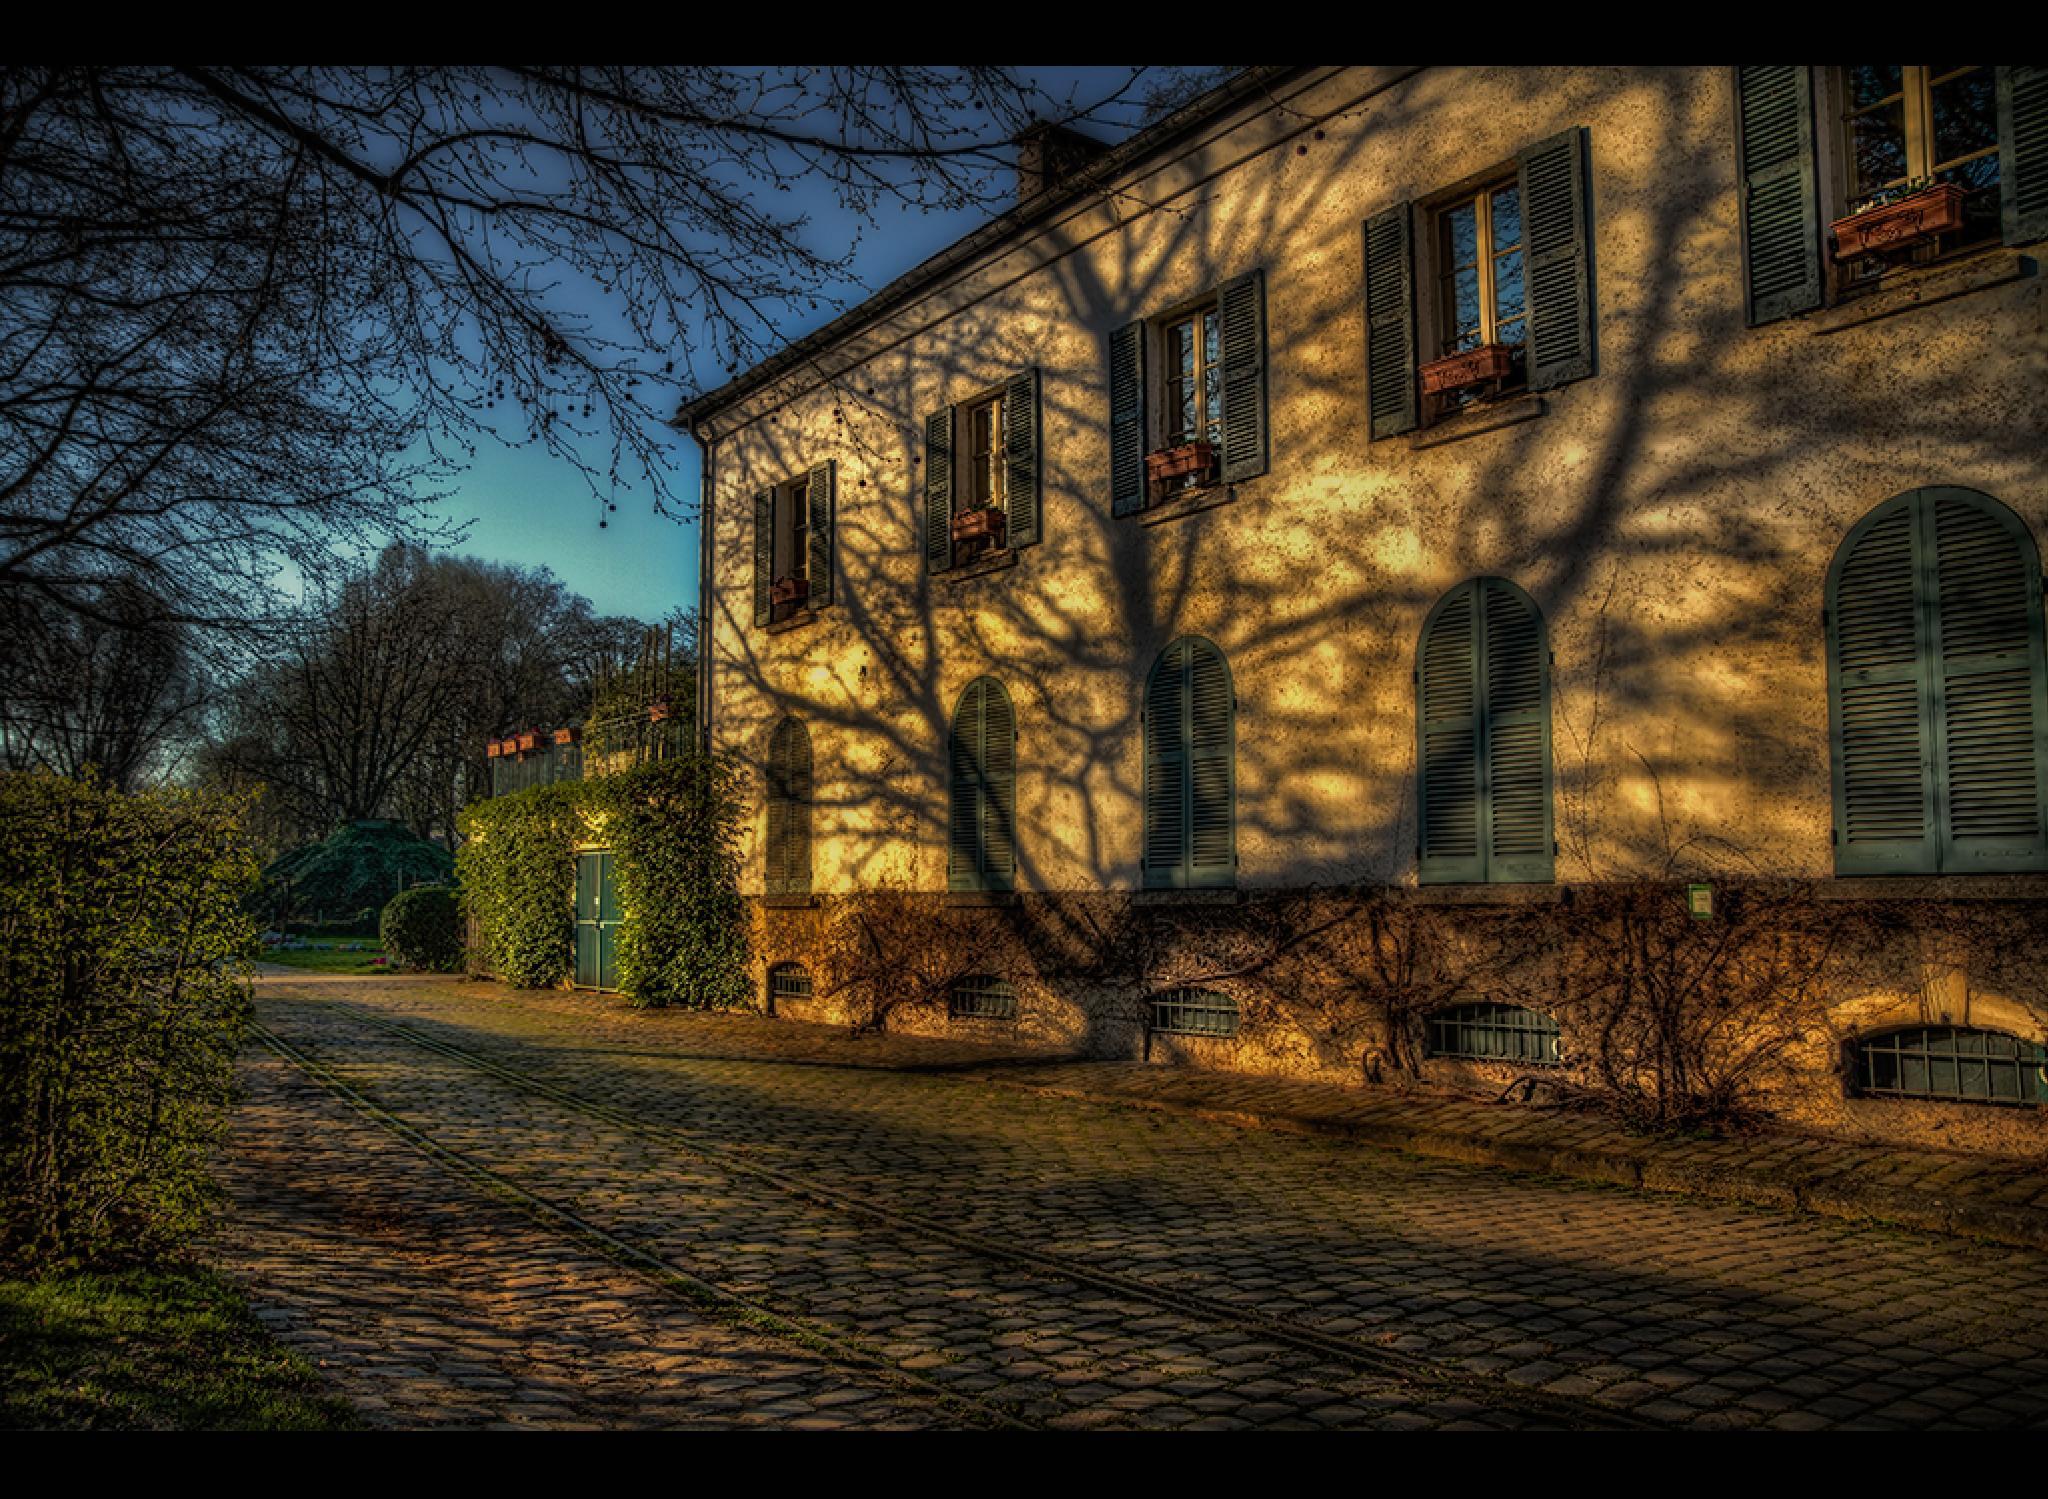 Bercy village by bolino